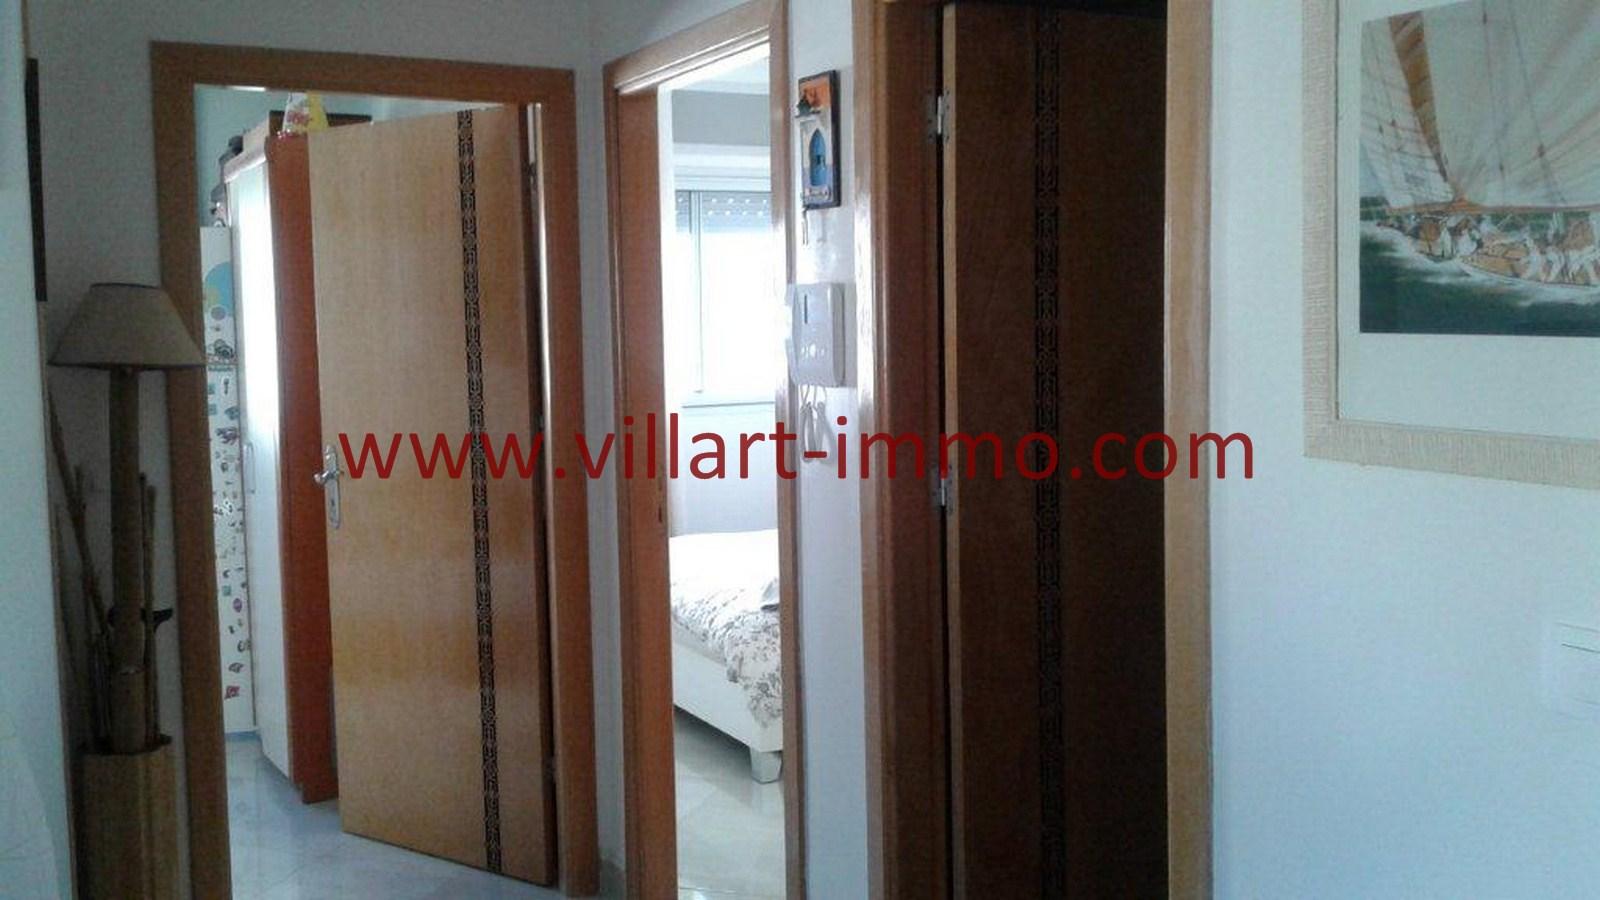 4-A vendre-Appartement-Tanger-Castilla-Entrée-VA473-Villart immo-Agence Immobilière